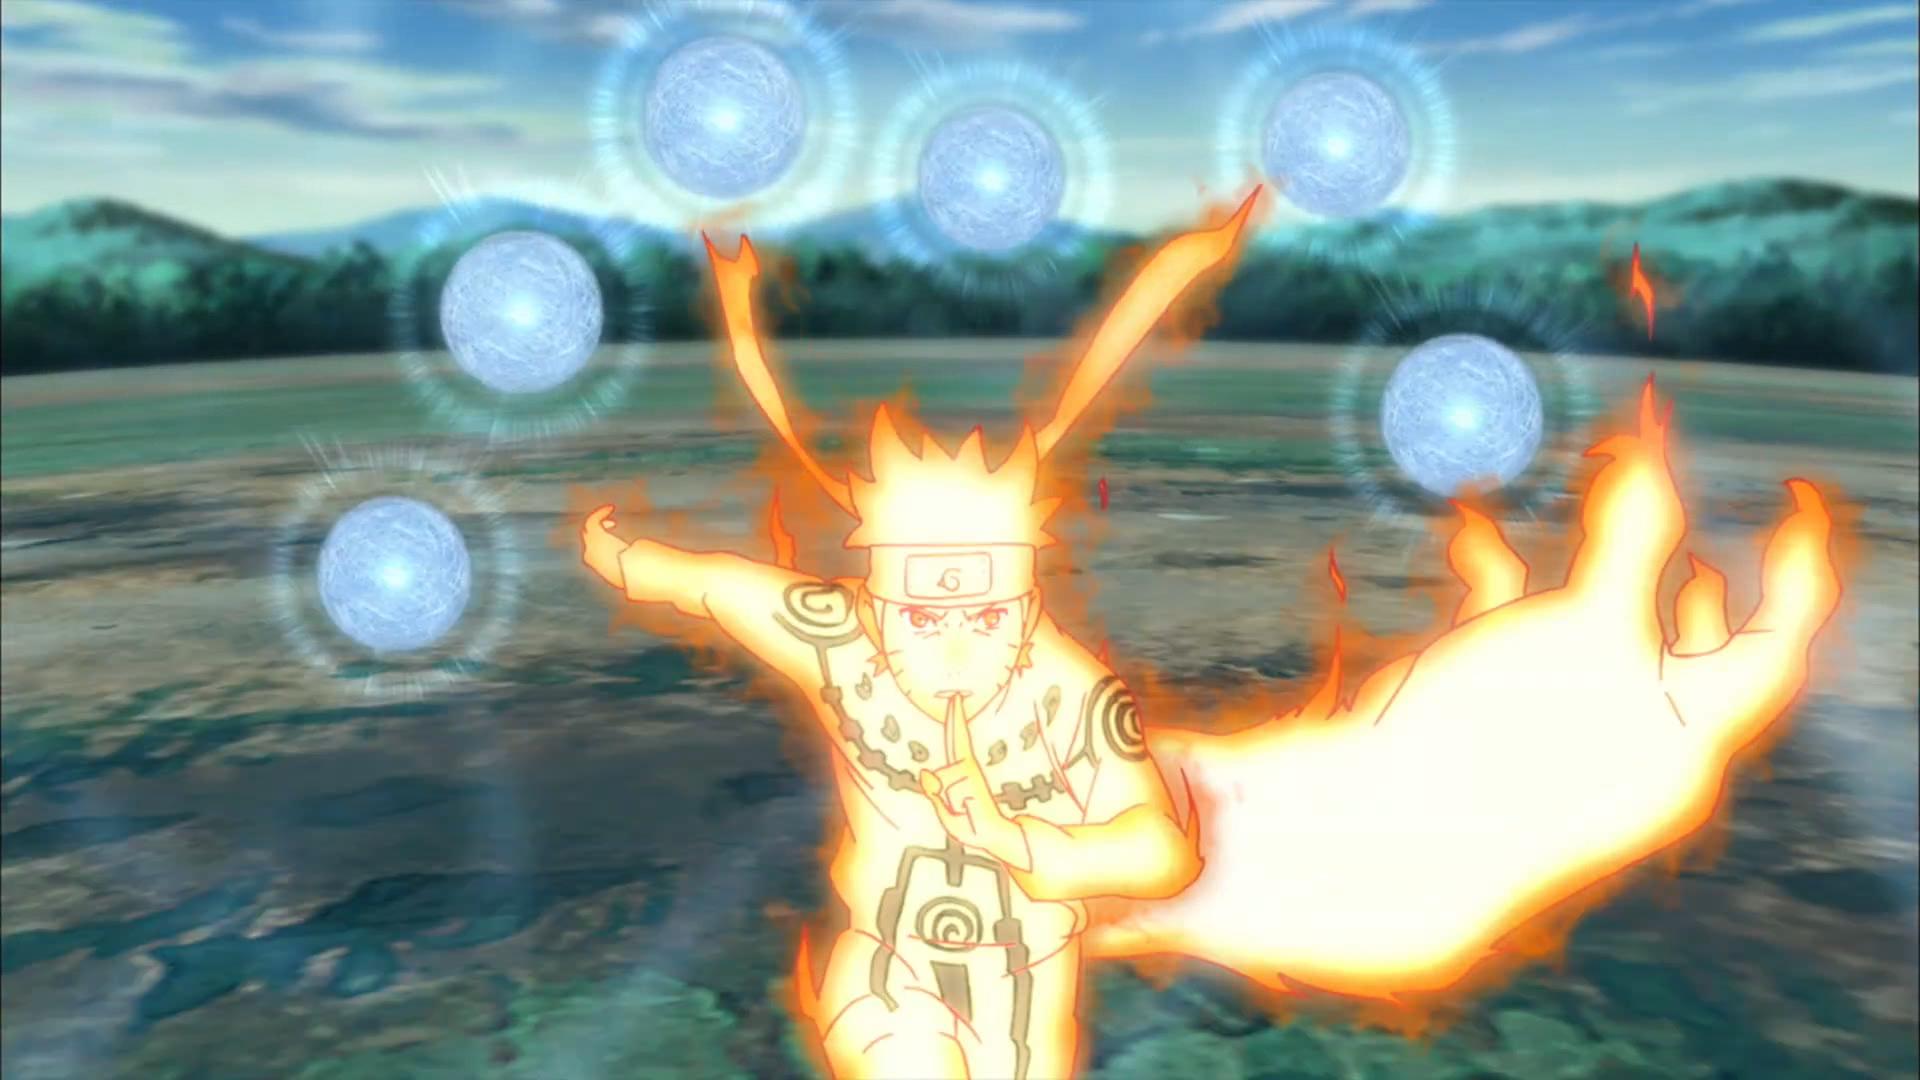 [FP] Uzumaki Naruto Rasenrangan